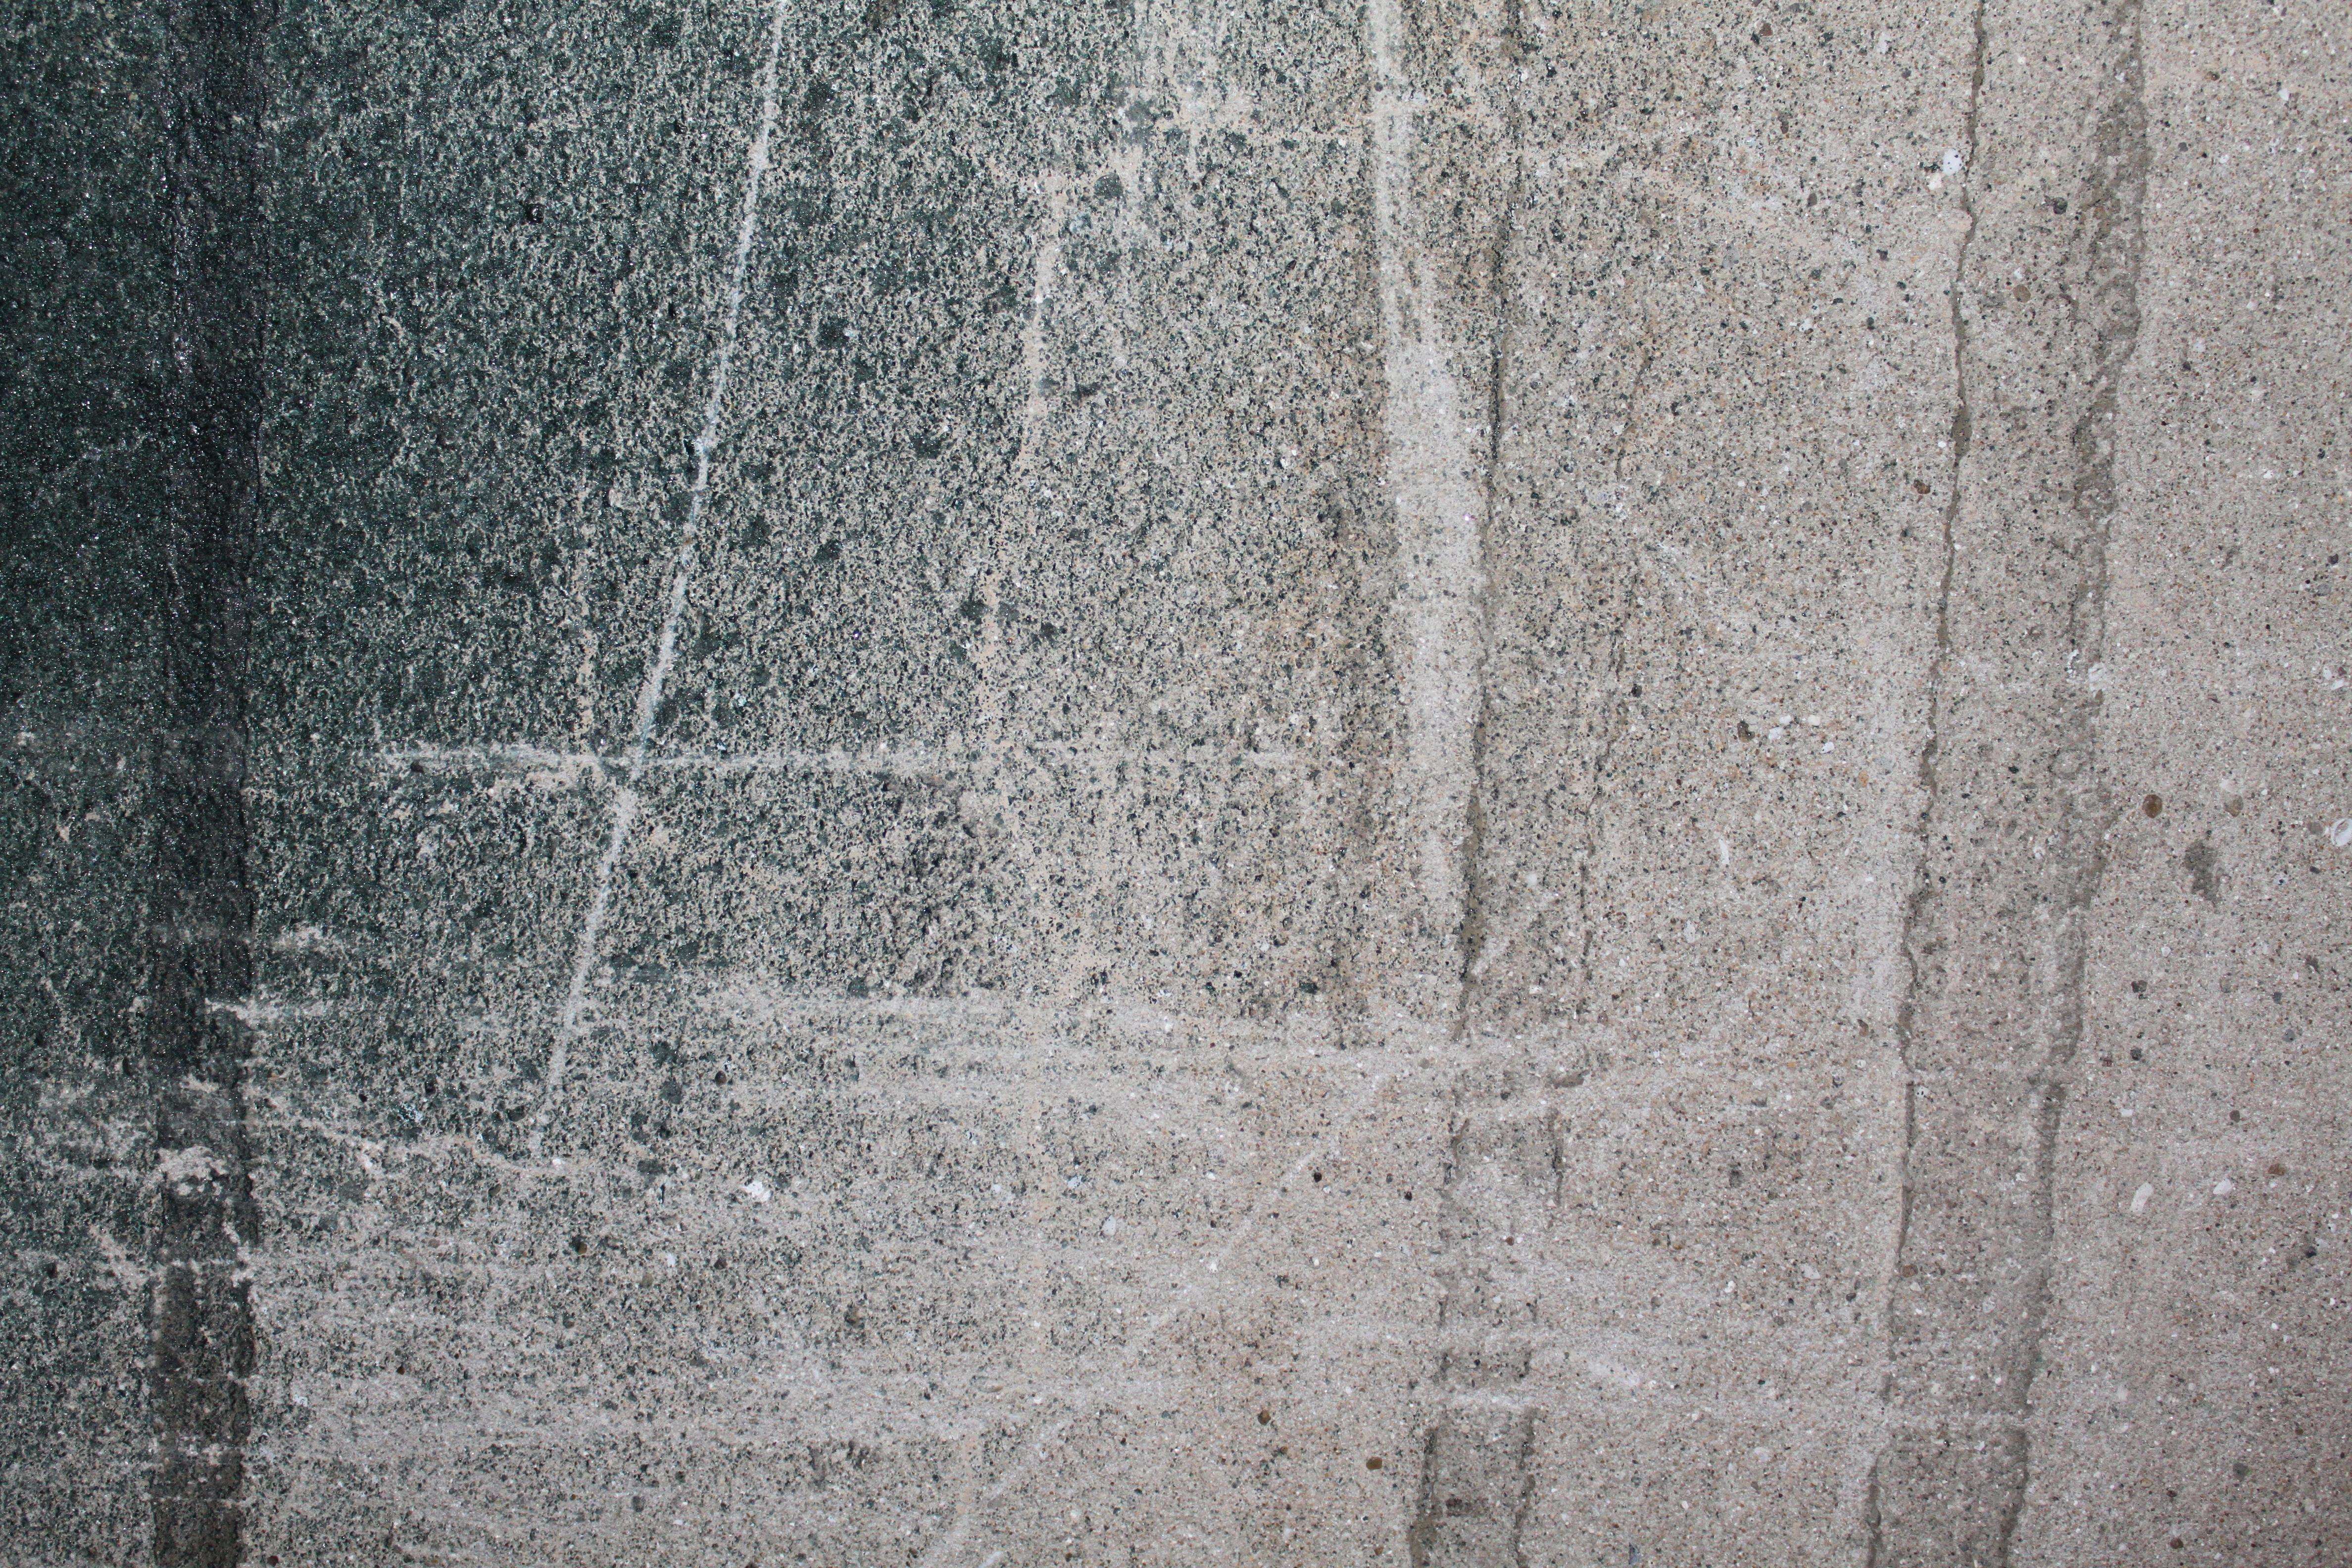 Spray Texture On Wall